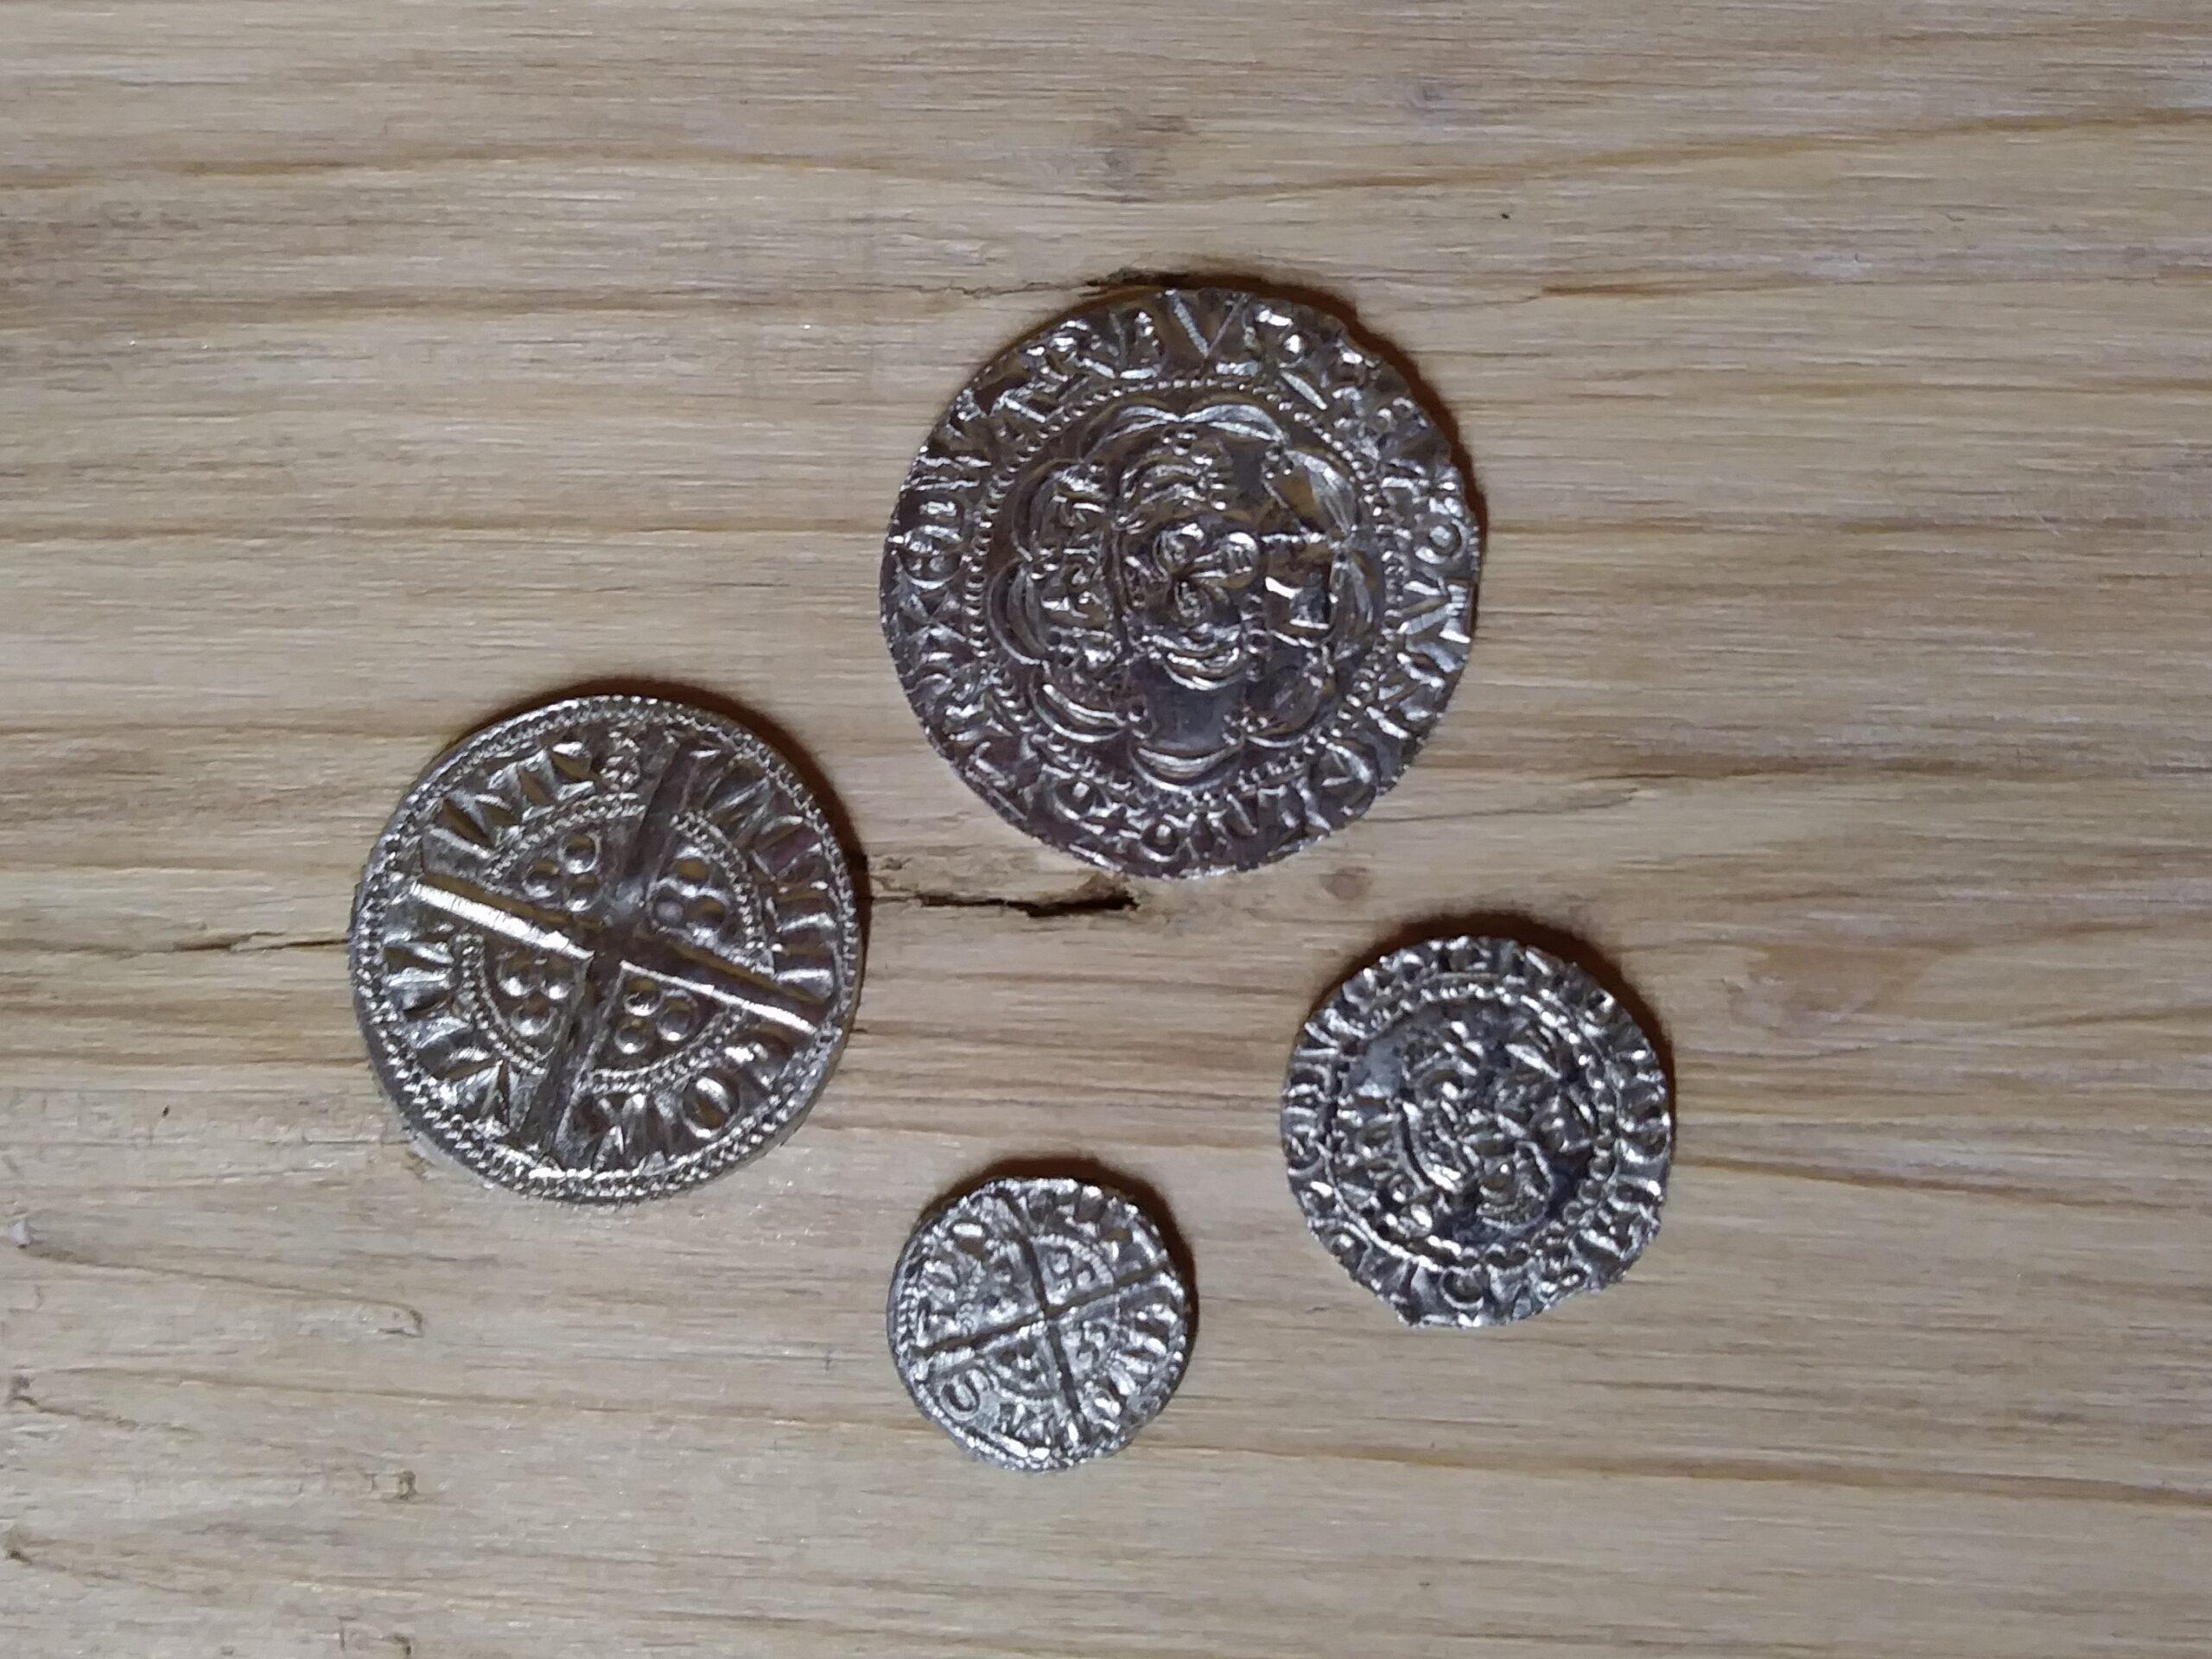 14thC replica medieval coins.